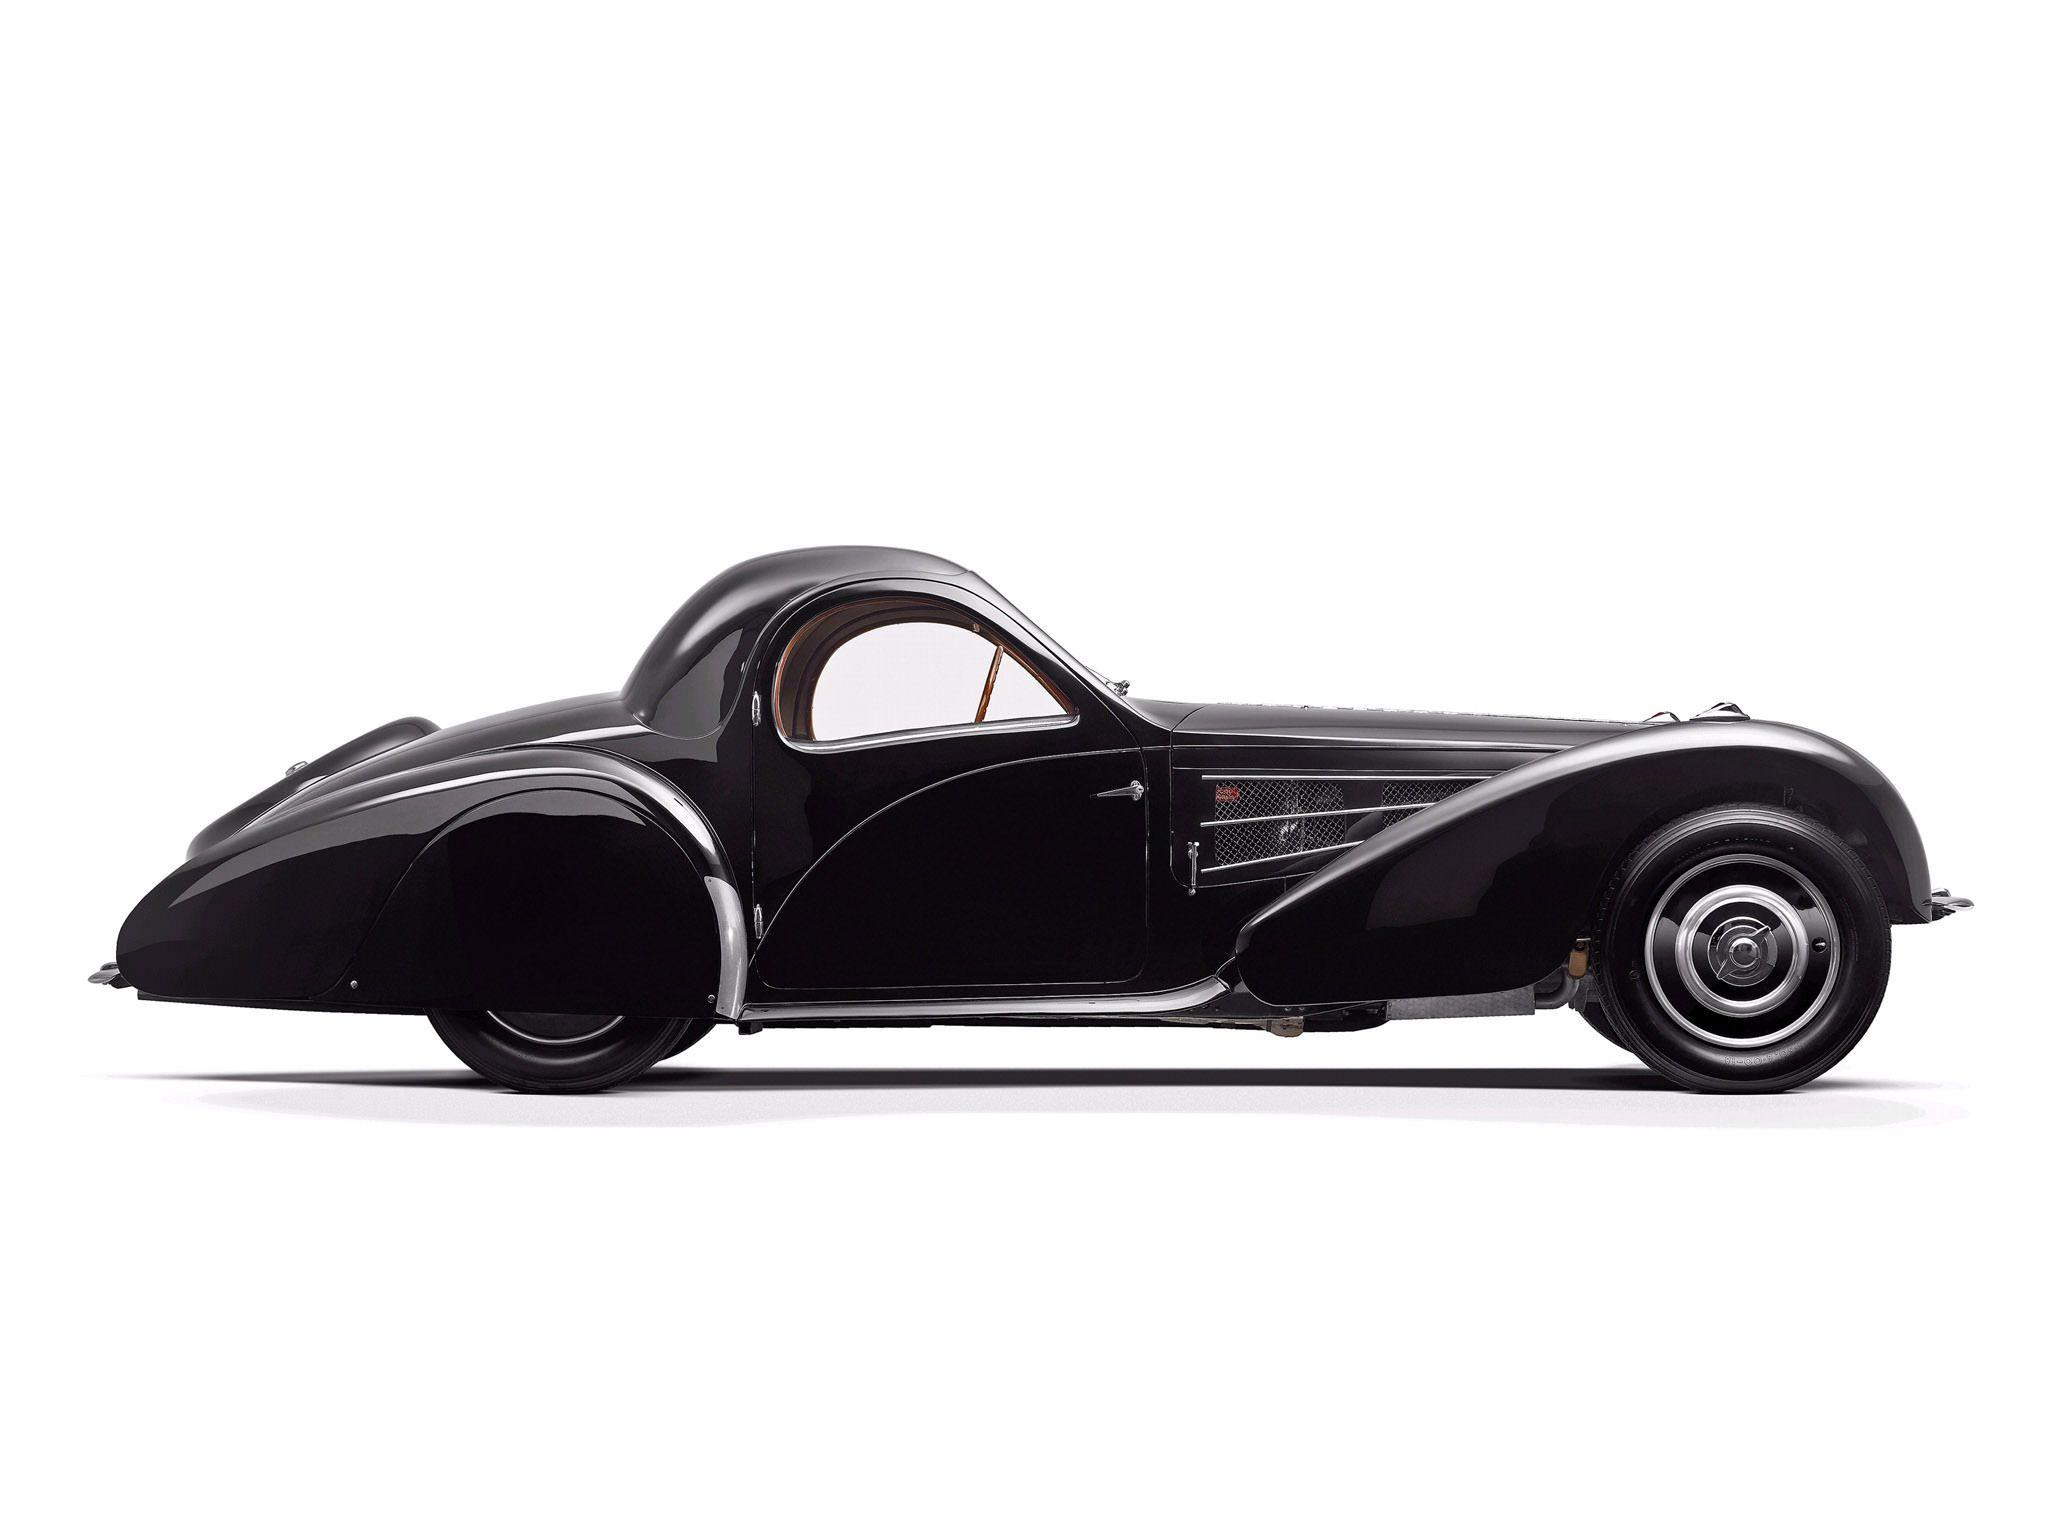 Bugatti Type 57sc Cutaway Wallpaper Bugatti Type 57 Bugatti Bugatti Cars